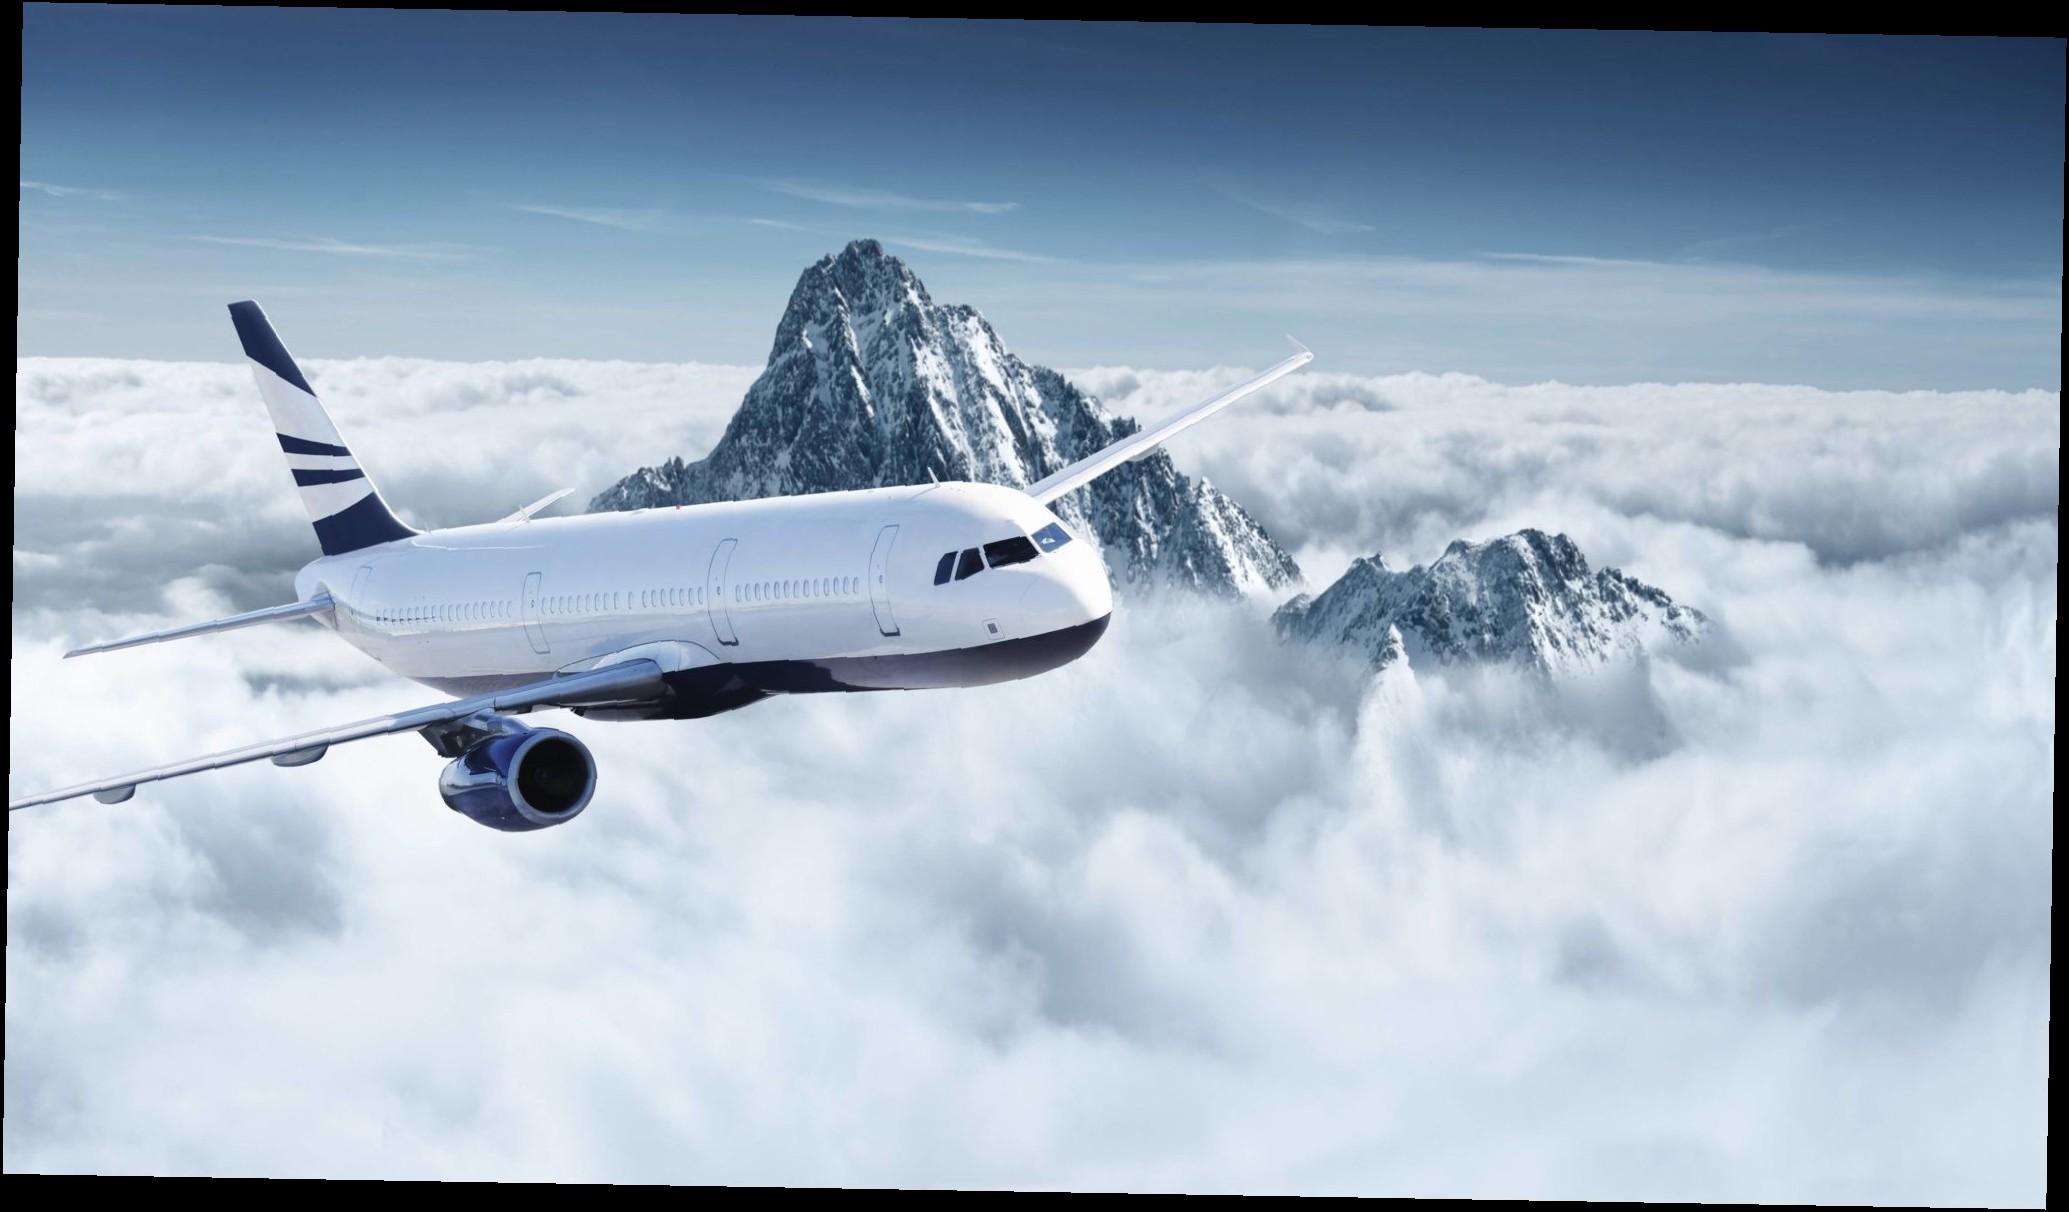 17 16 - Аэропорт Араджип (Aragip) коды IATA: ARP ICAO:  город: Араджип (Aragip) страна: Папуа - Новая Гвинея (Papua New Guinea)